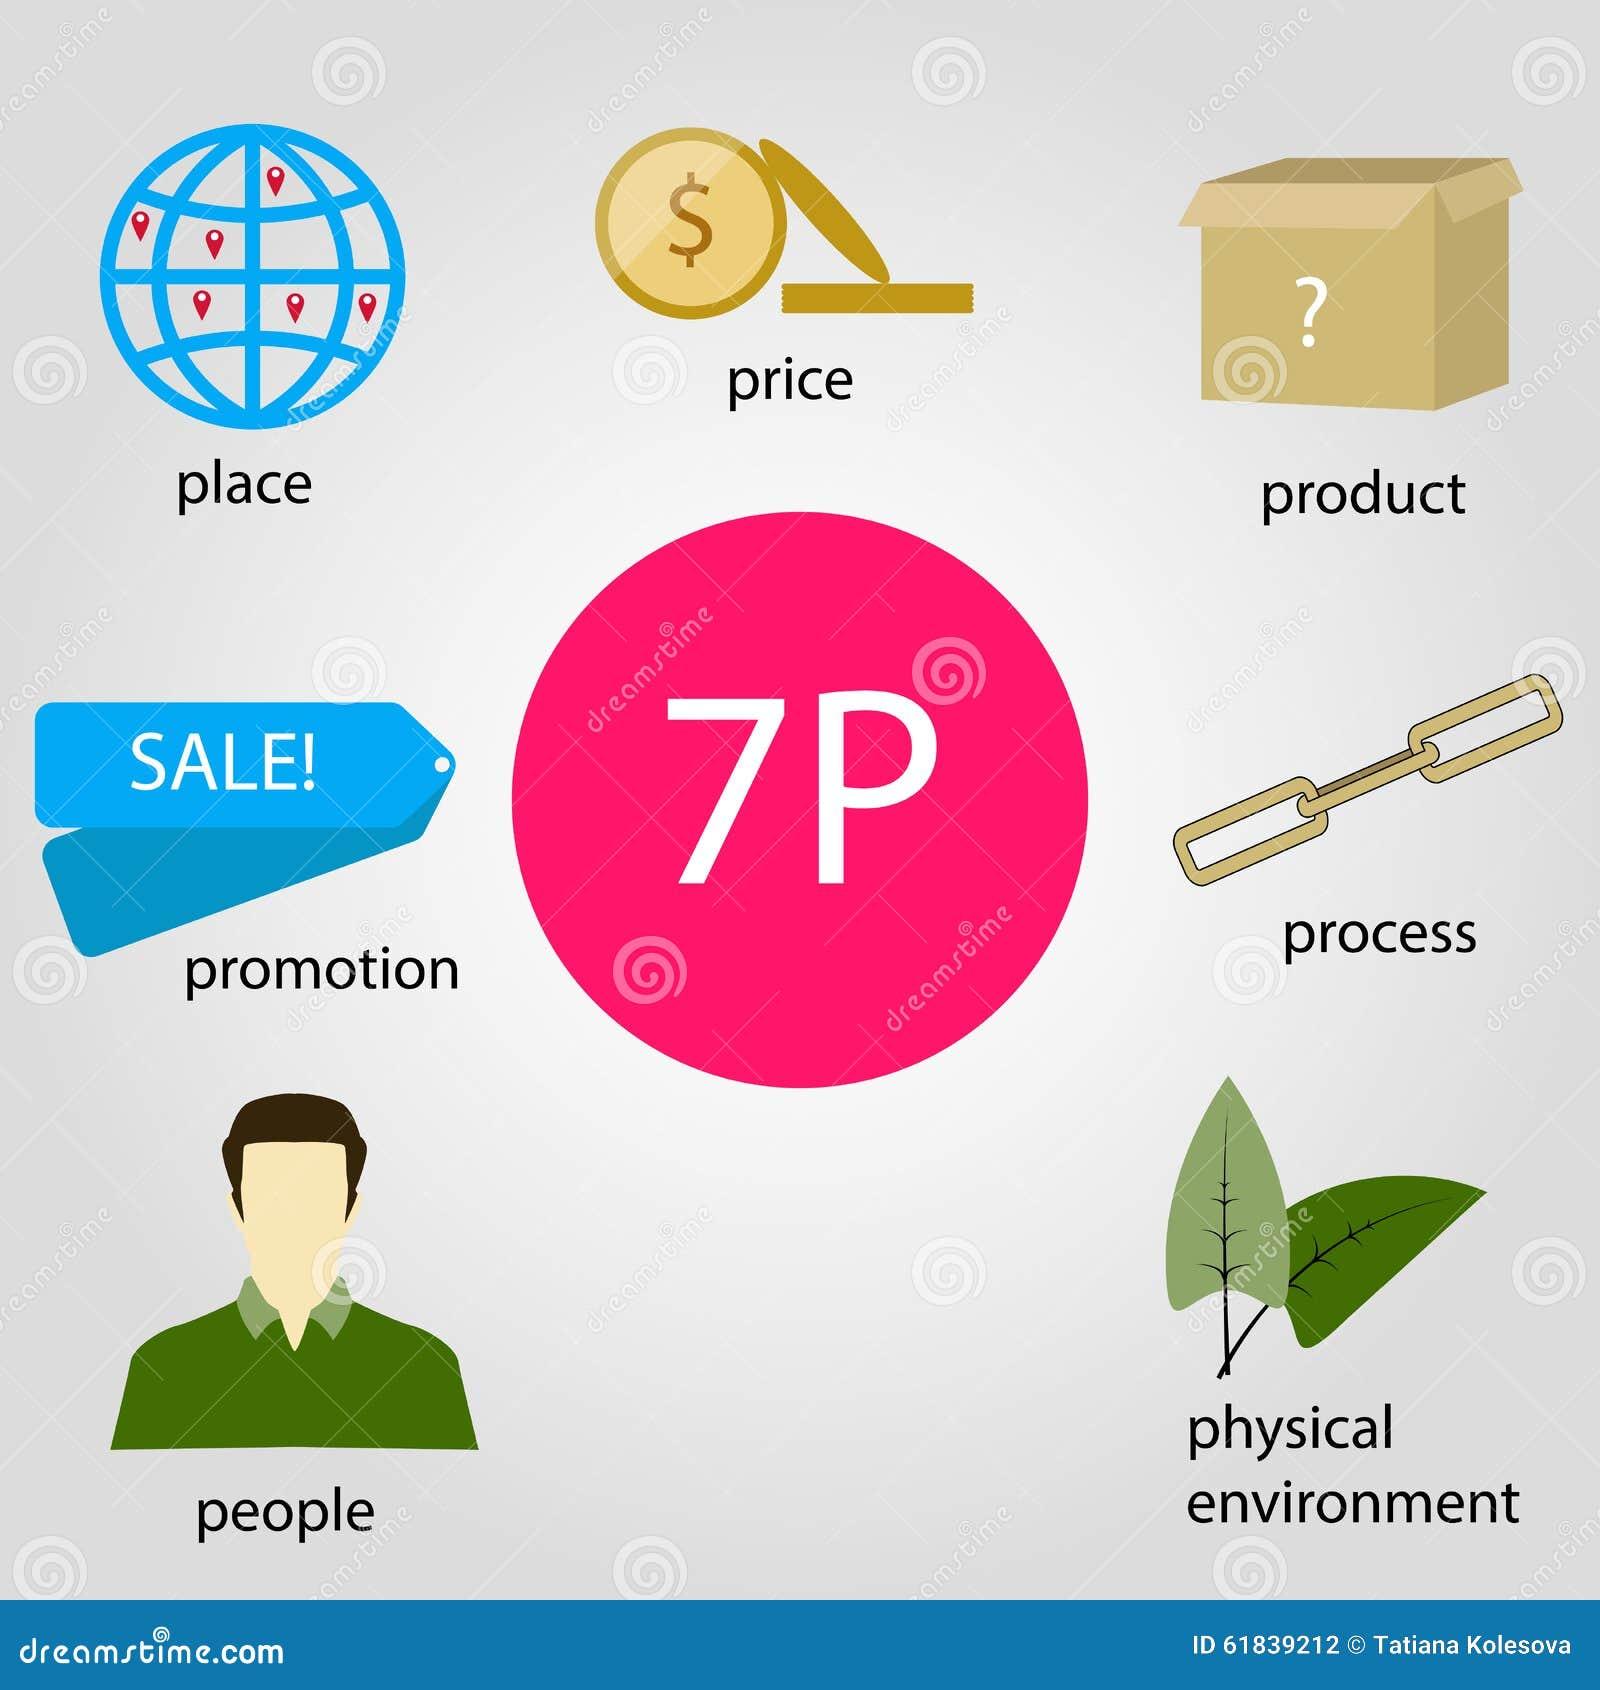 7p marketing icons stock vecto...